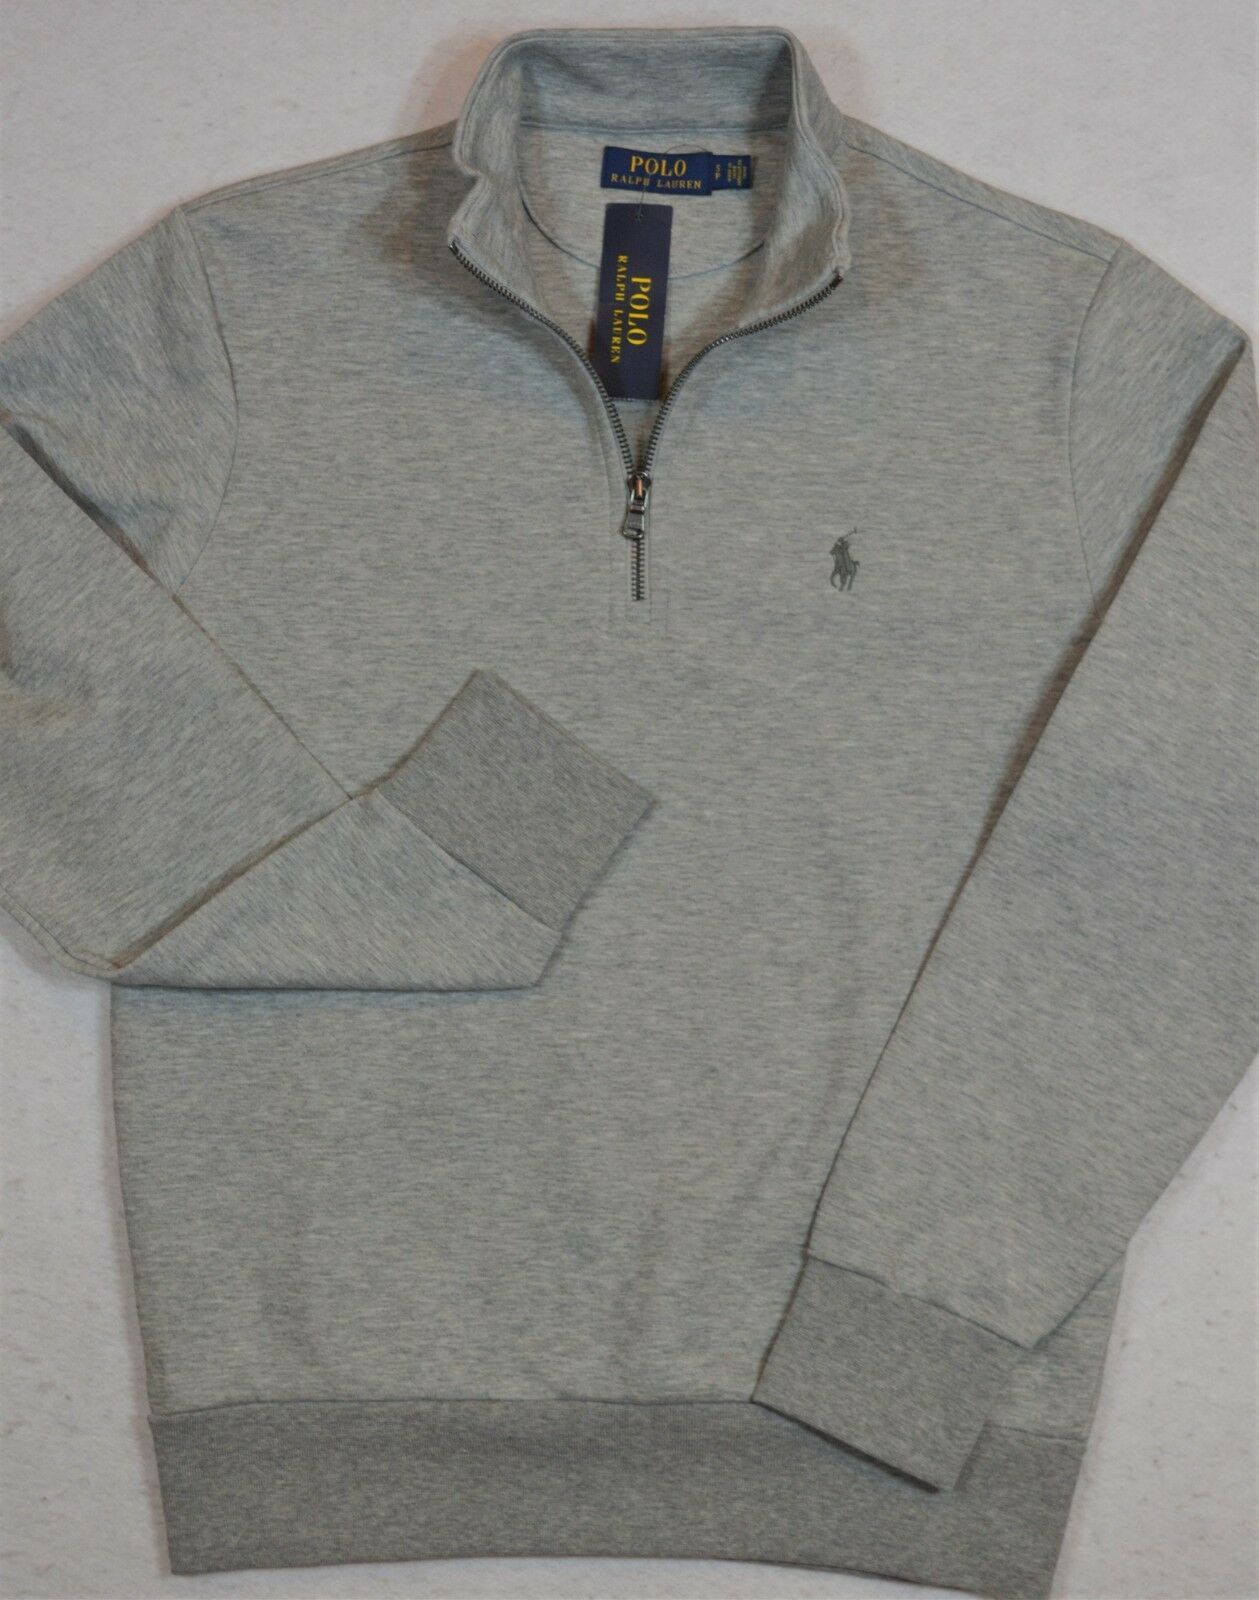 Polo Ralph Lauren Jersey Pullover 1/2 Half-Zip grau Größe S Small NWT